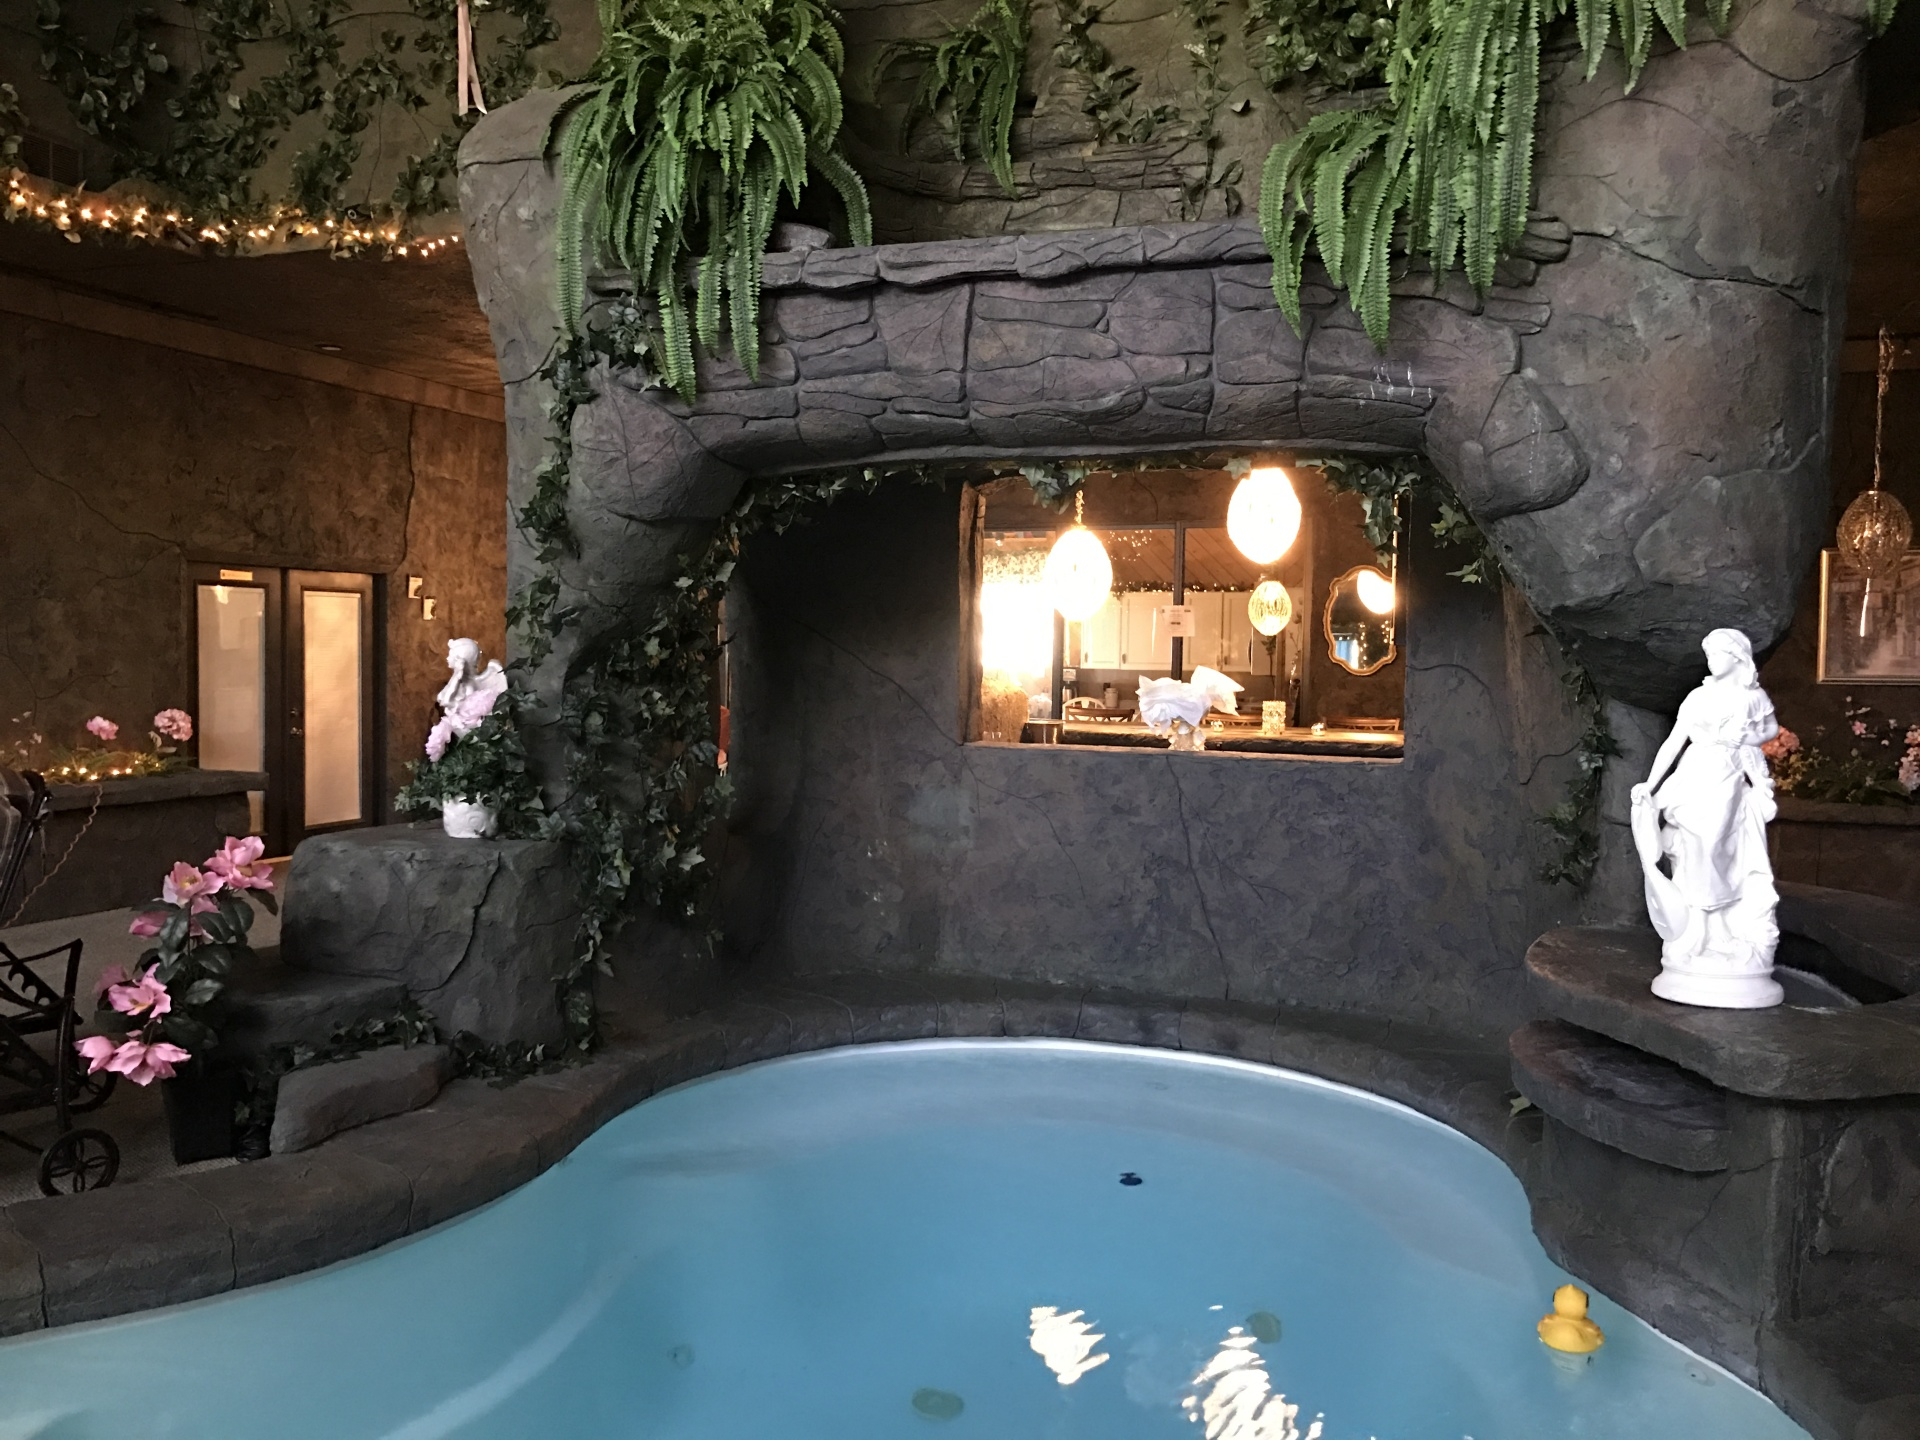 Summer Scallop Vacation @ Heilig Haus, Vacation Rentals, Homosassa, Crystal River, Florida